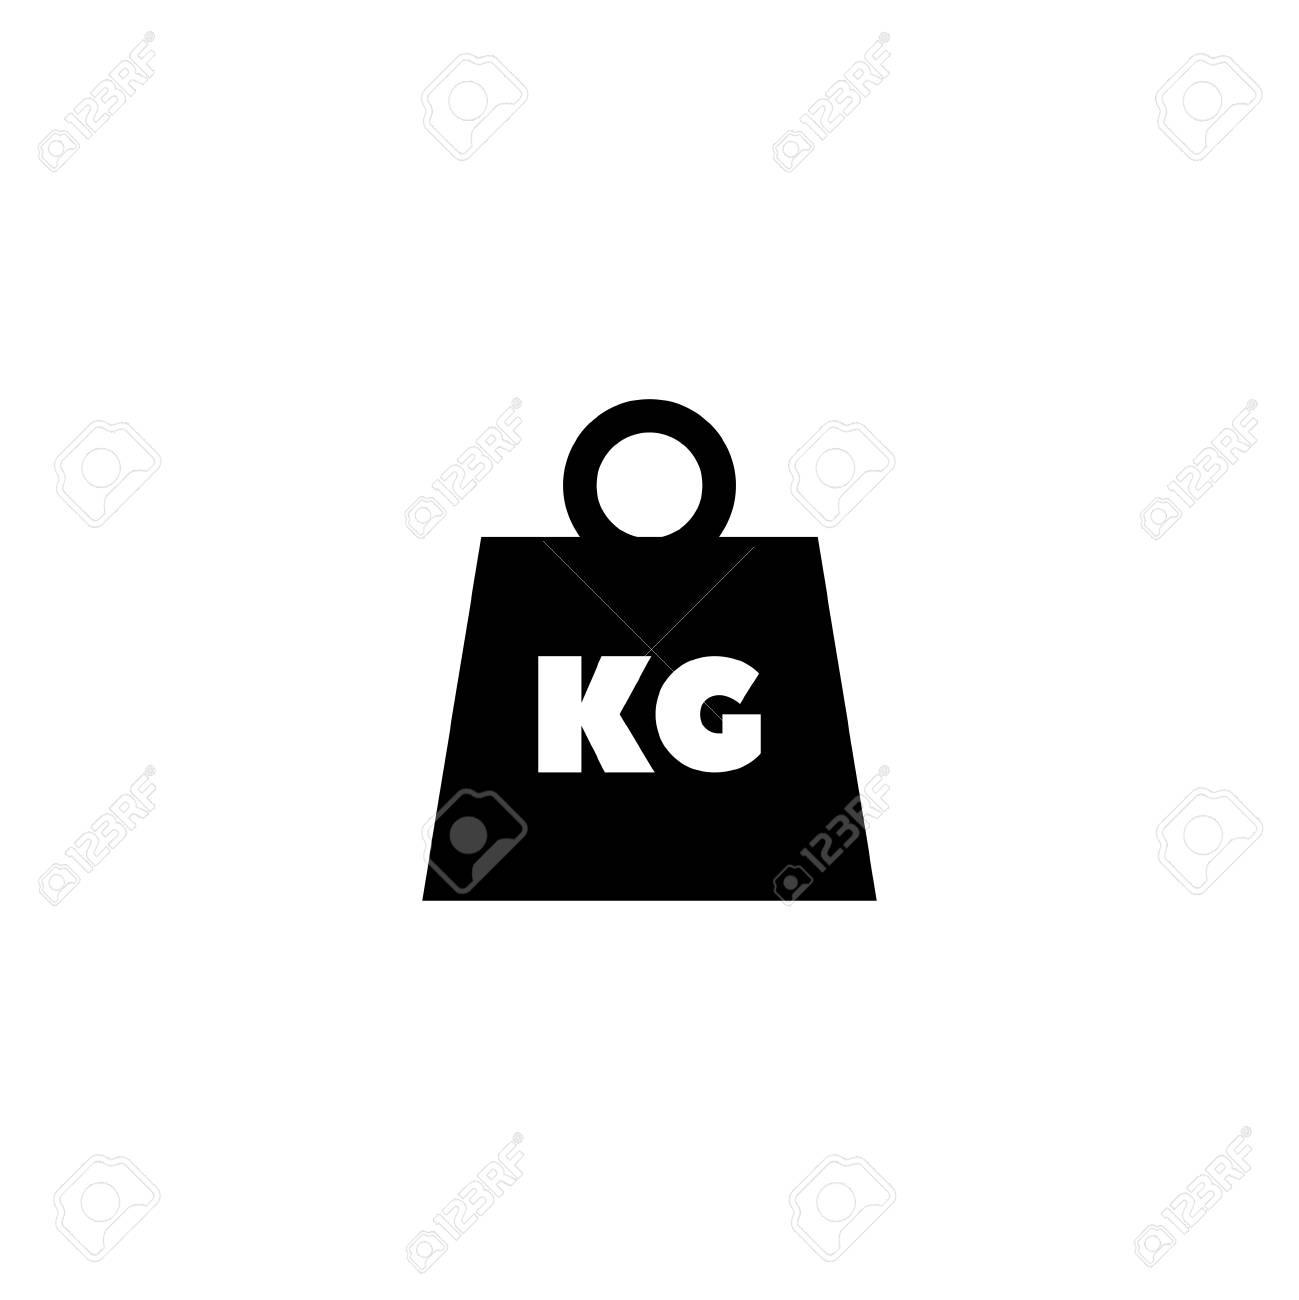 Weight Kilogram Flat Vector Icon Illustration Simple Black